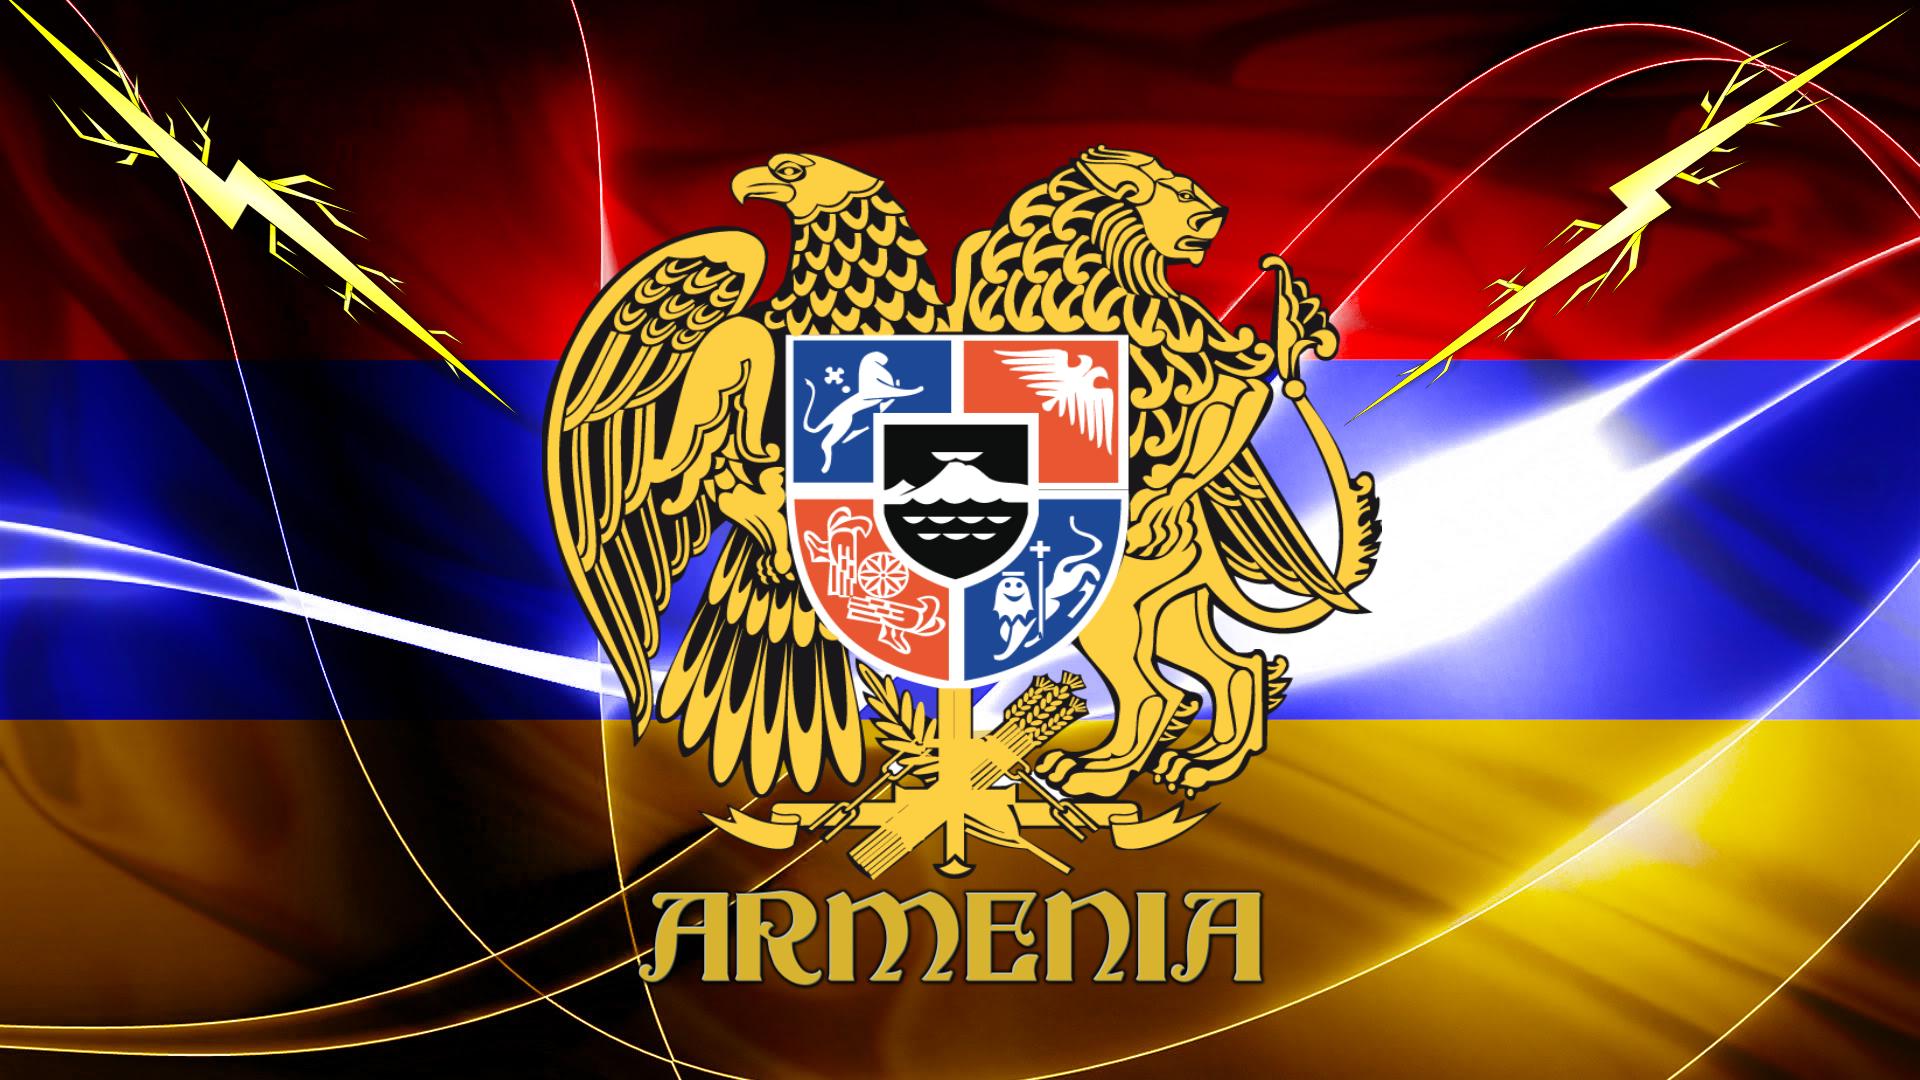 ARMENIA 1915: The Genocide Turkey - 1580.2KB